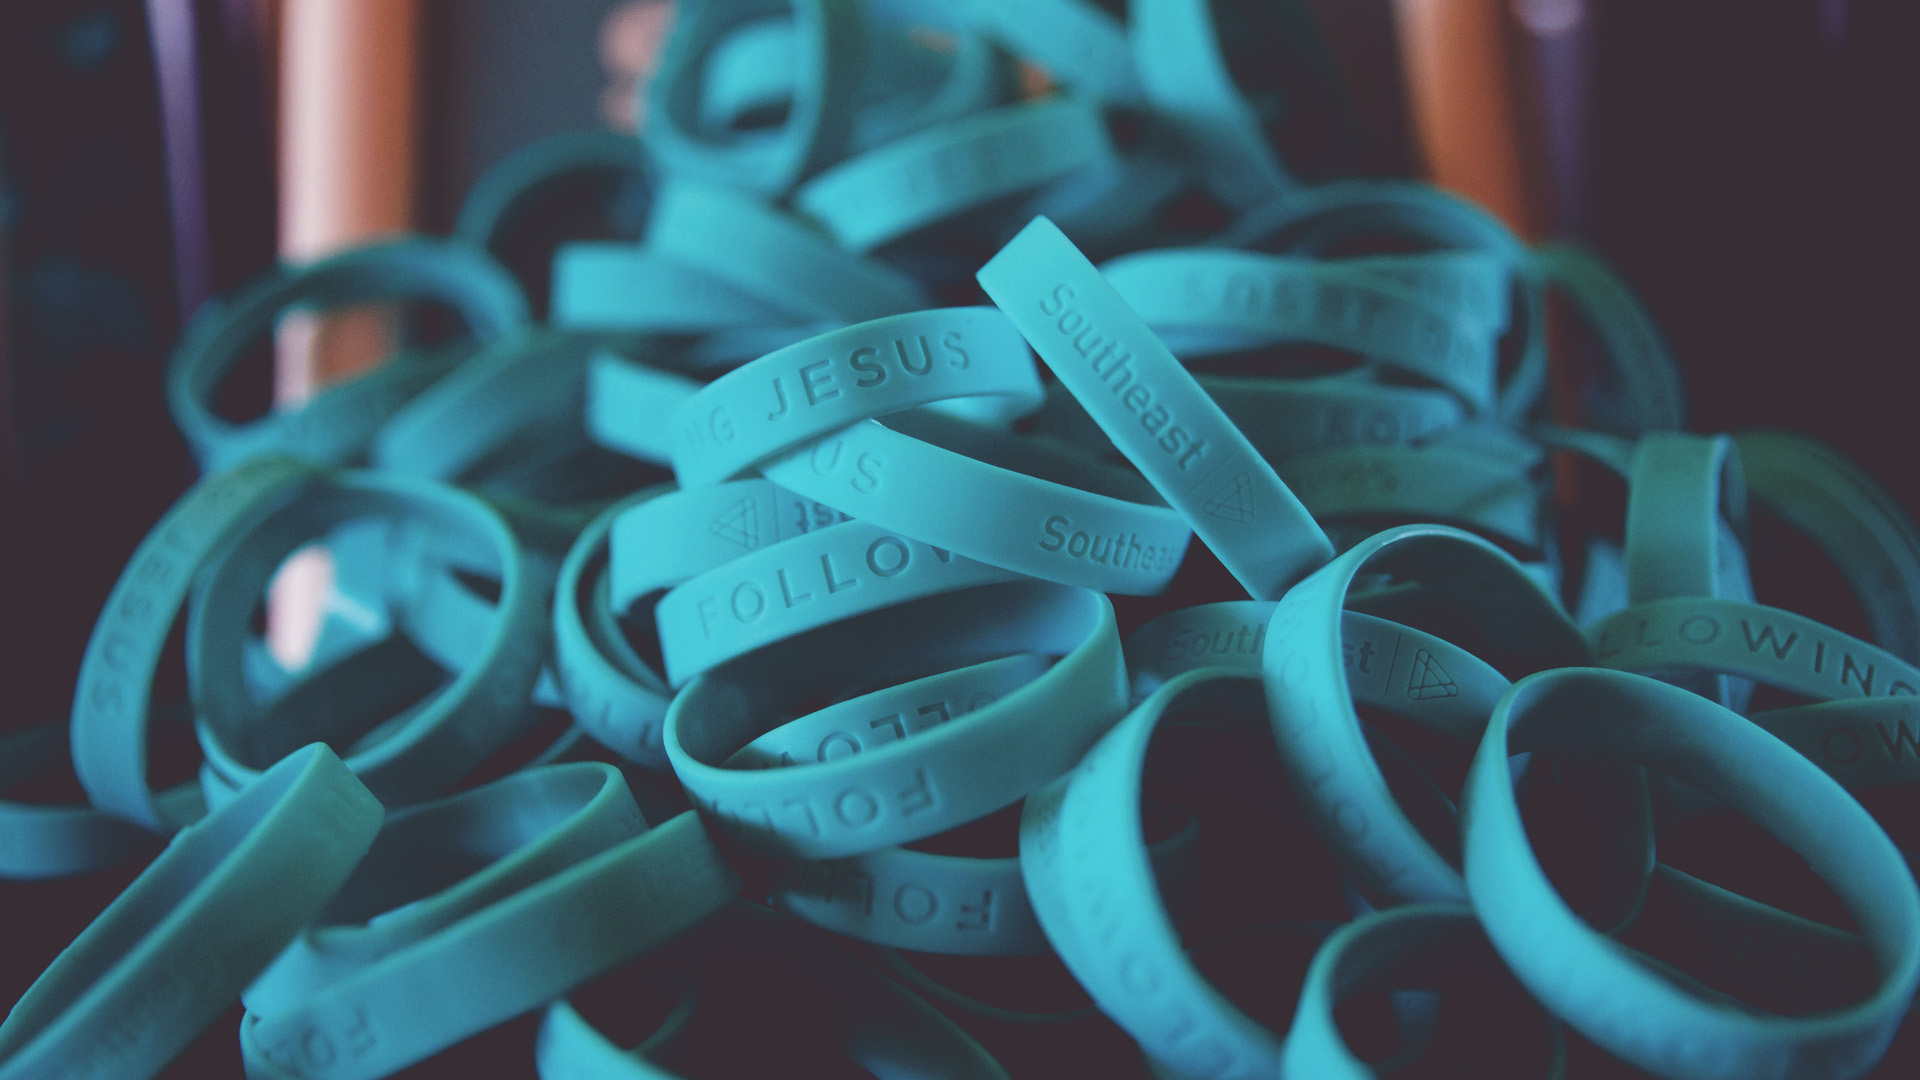 rebrand-wristbands1.jpg